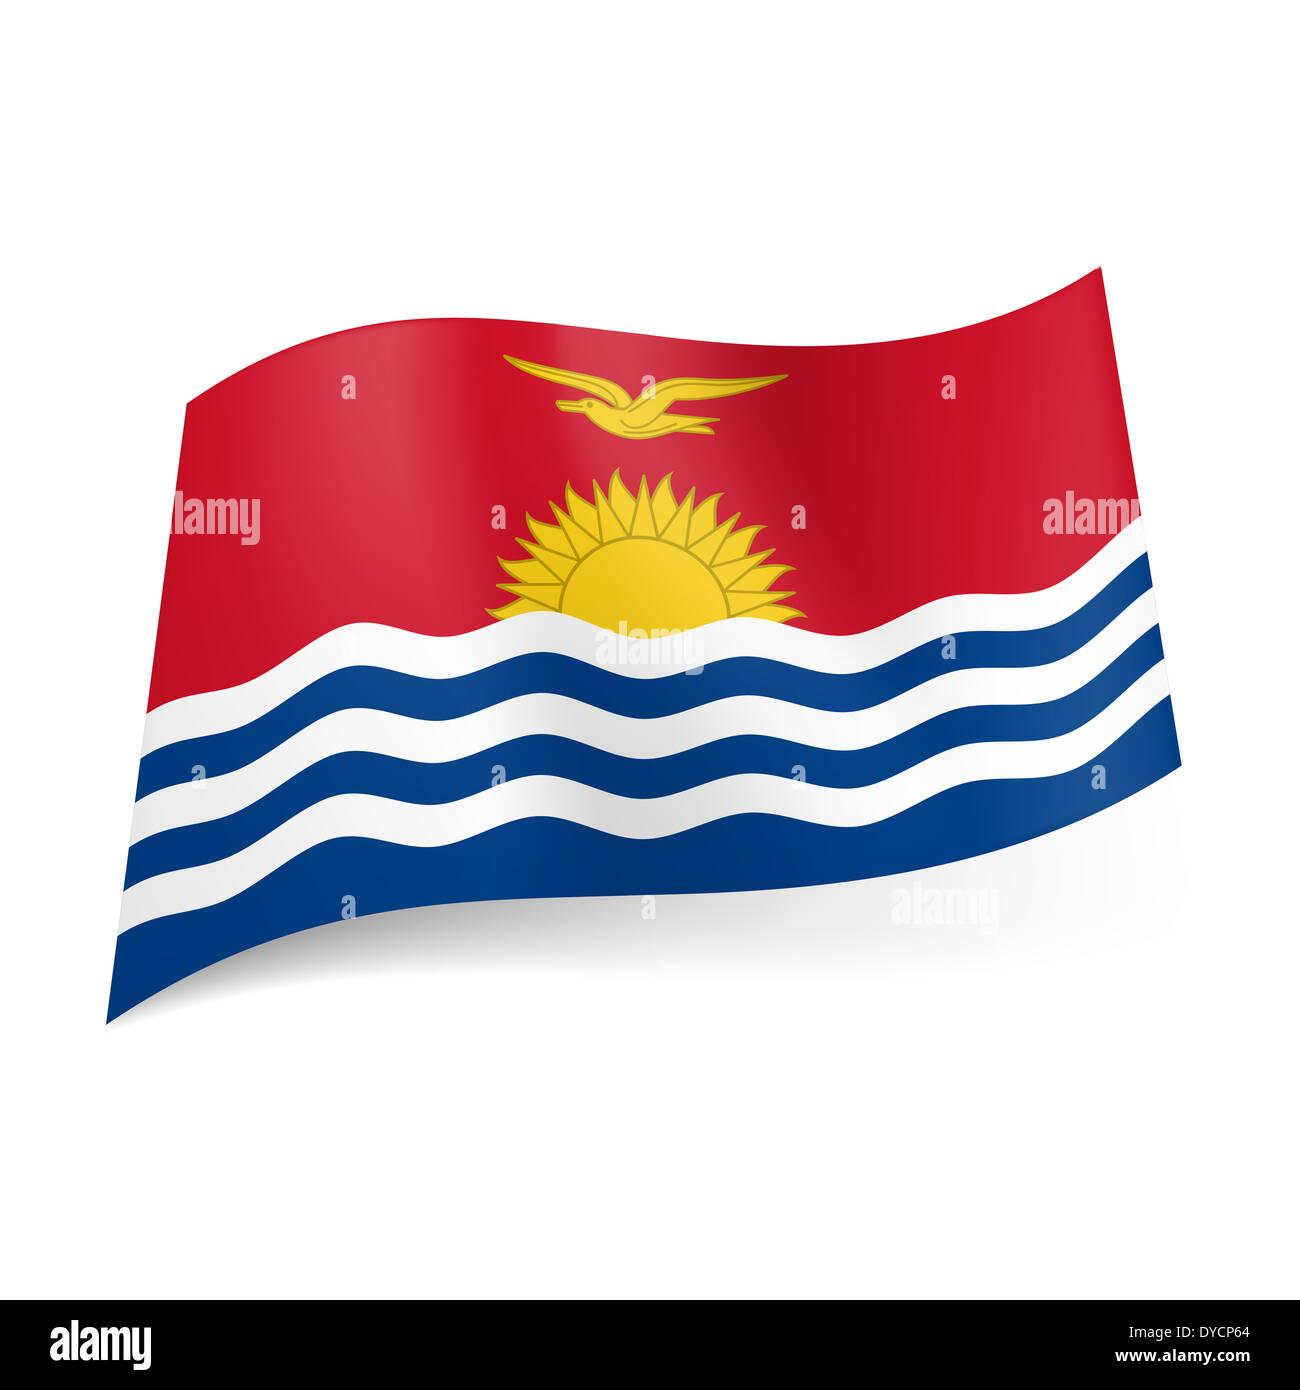 National flag of kiribati ocean image with sun and bird above on national flag of kiribati ocean image with sun and bird above on red background sciox Choice Image